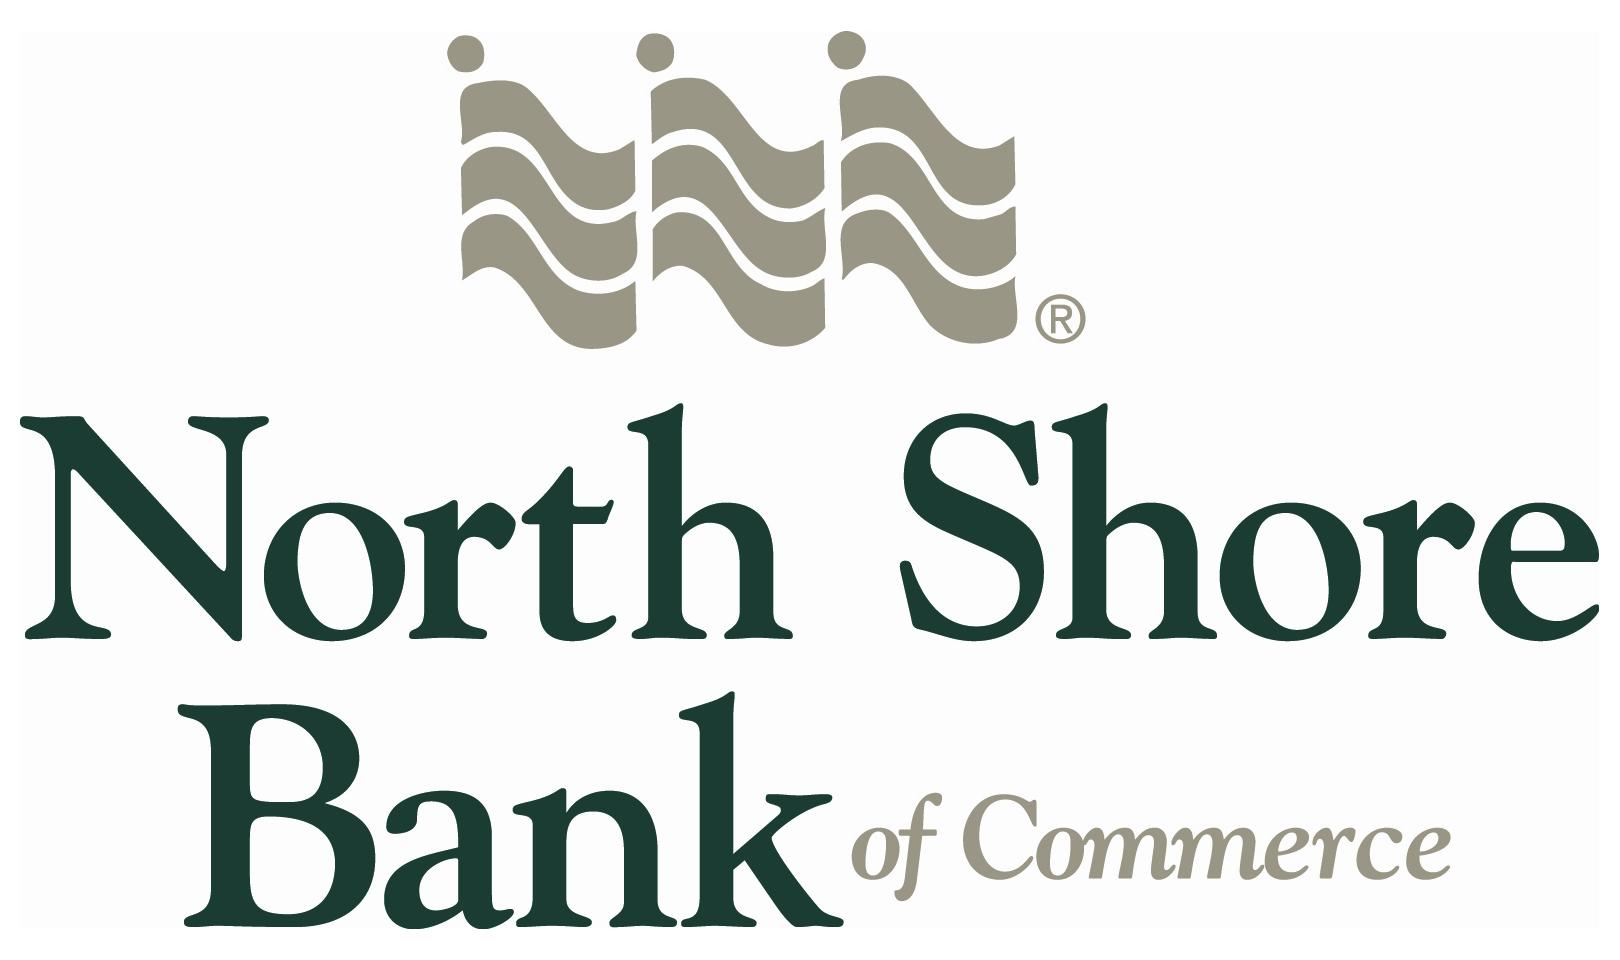 Golf-2011-North-Shore-Bank-of-Commerce-3-2011.jpg